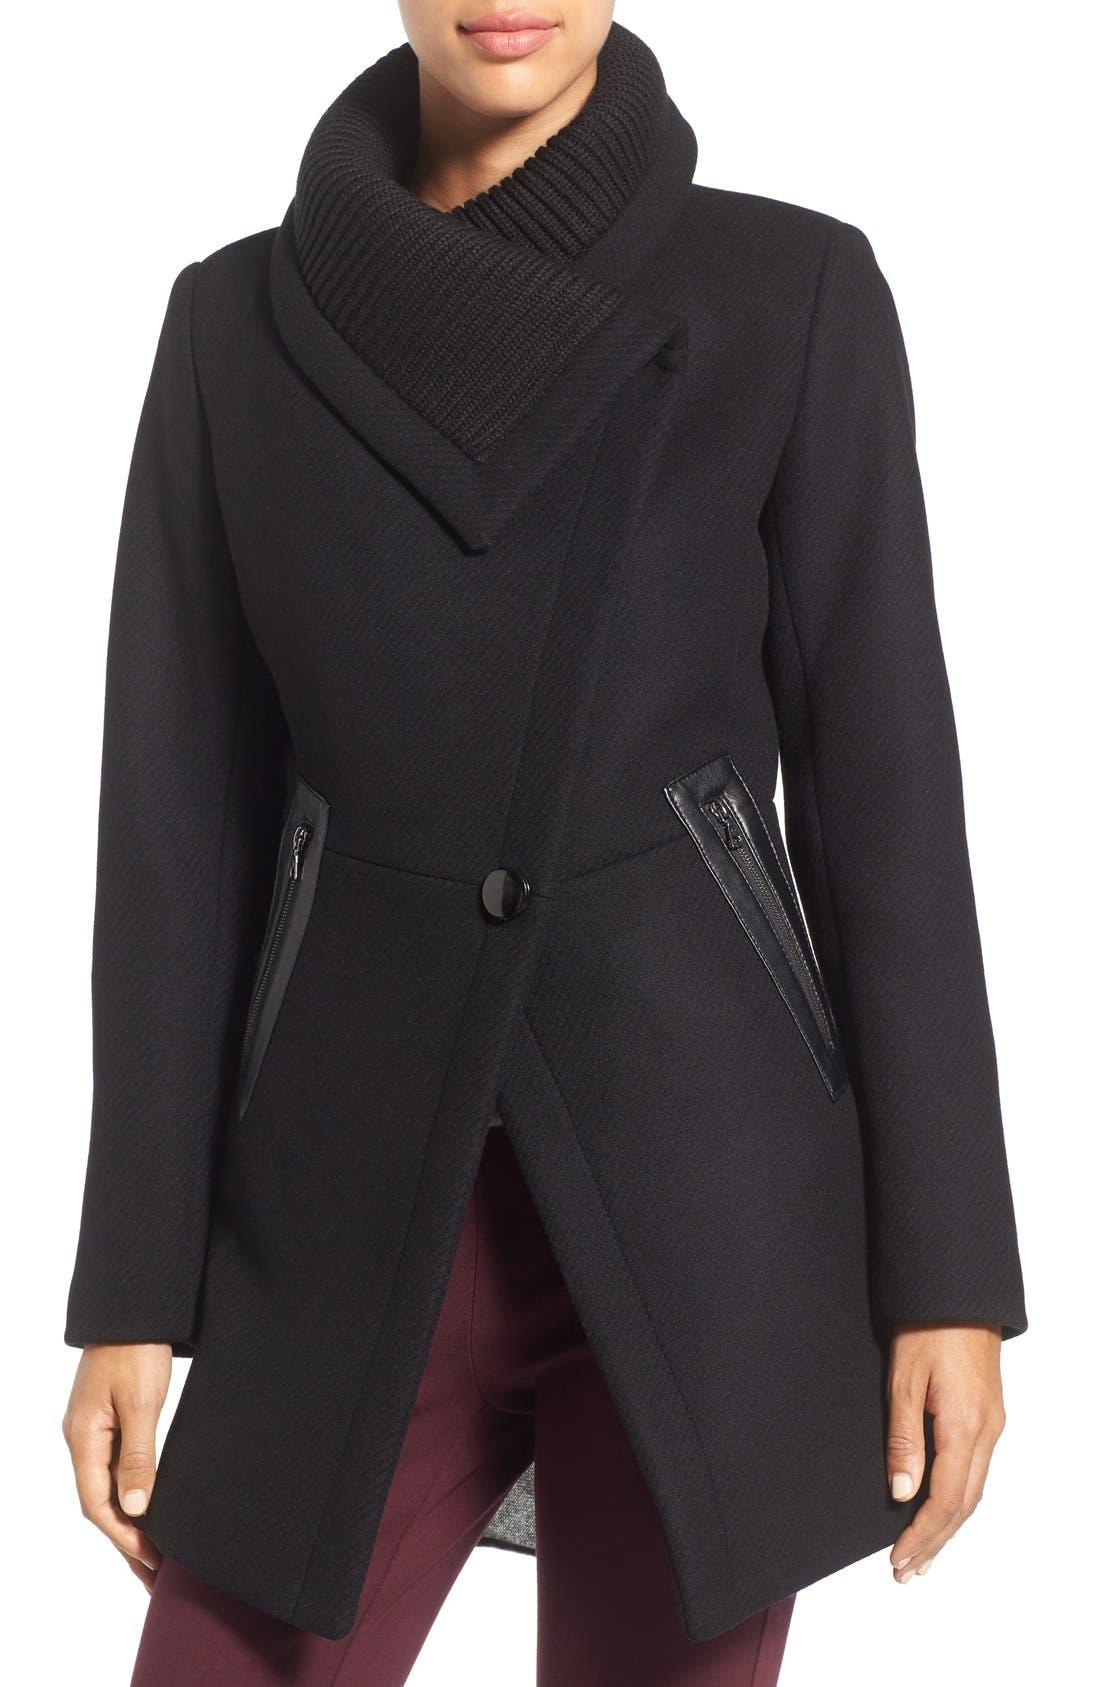 'Maddi' Knit Collar Cutaway Wool Blend Coat,                             Alternate thumbnail 4, color,                             001